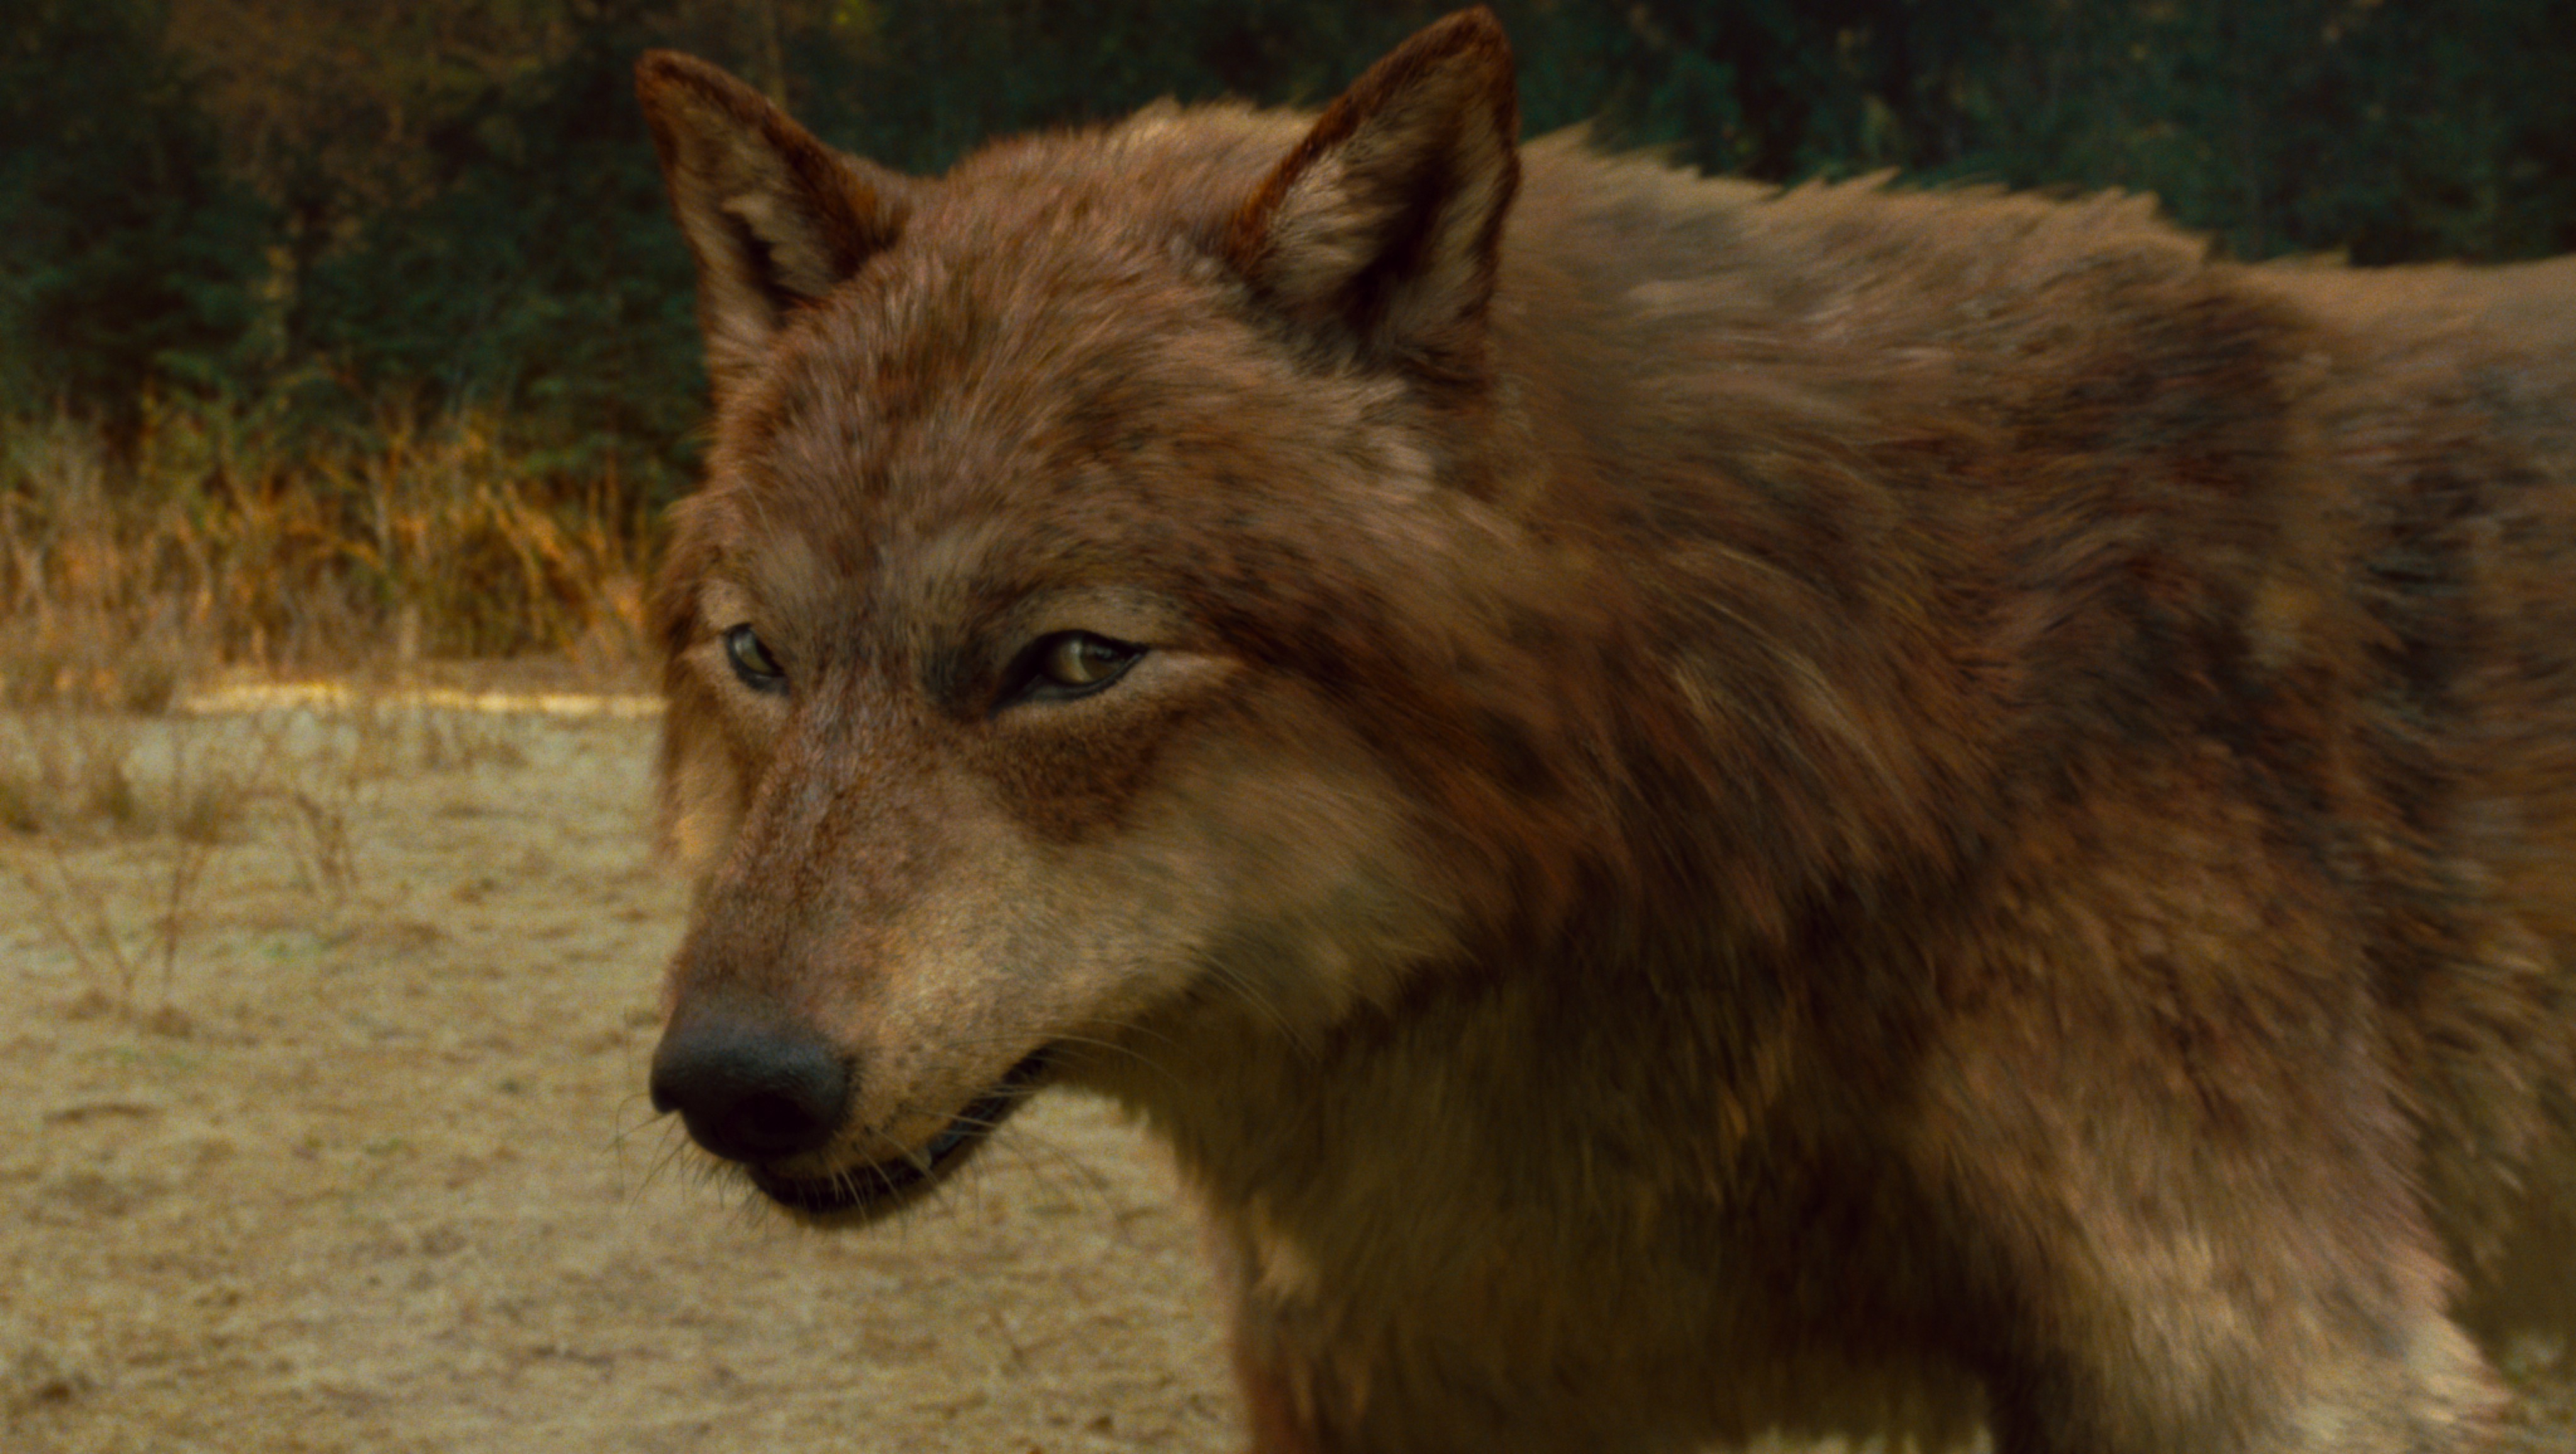 wolf run black dating site Muzzle loading & black powder guns kits, parts, accoutrements, rendezvous gear & primitive americana.